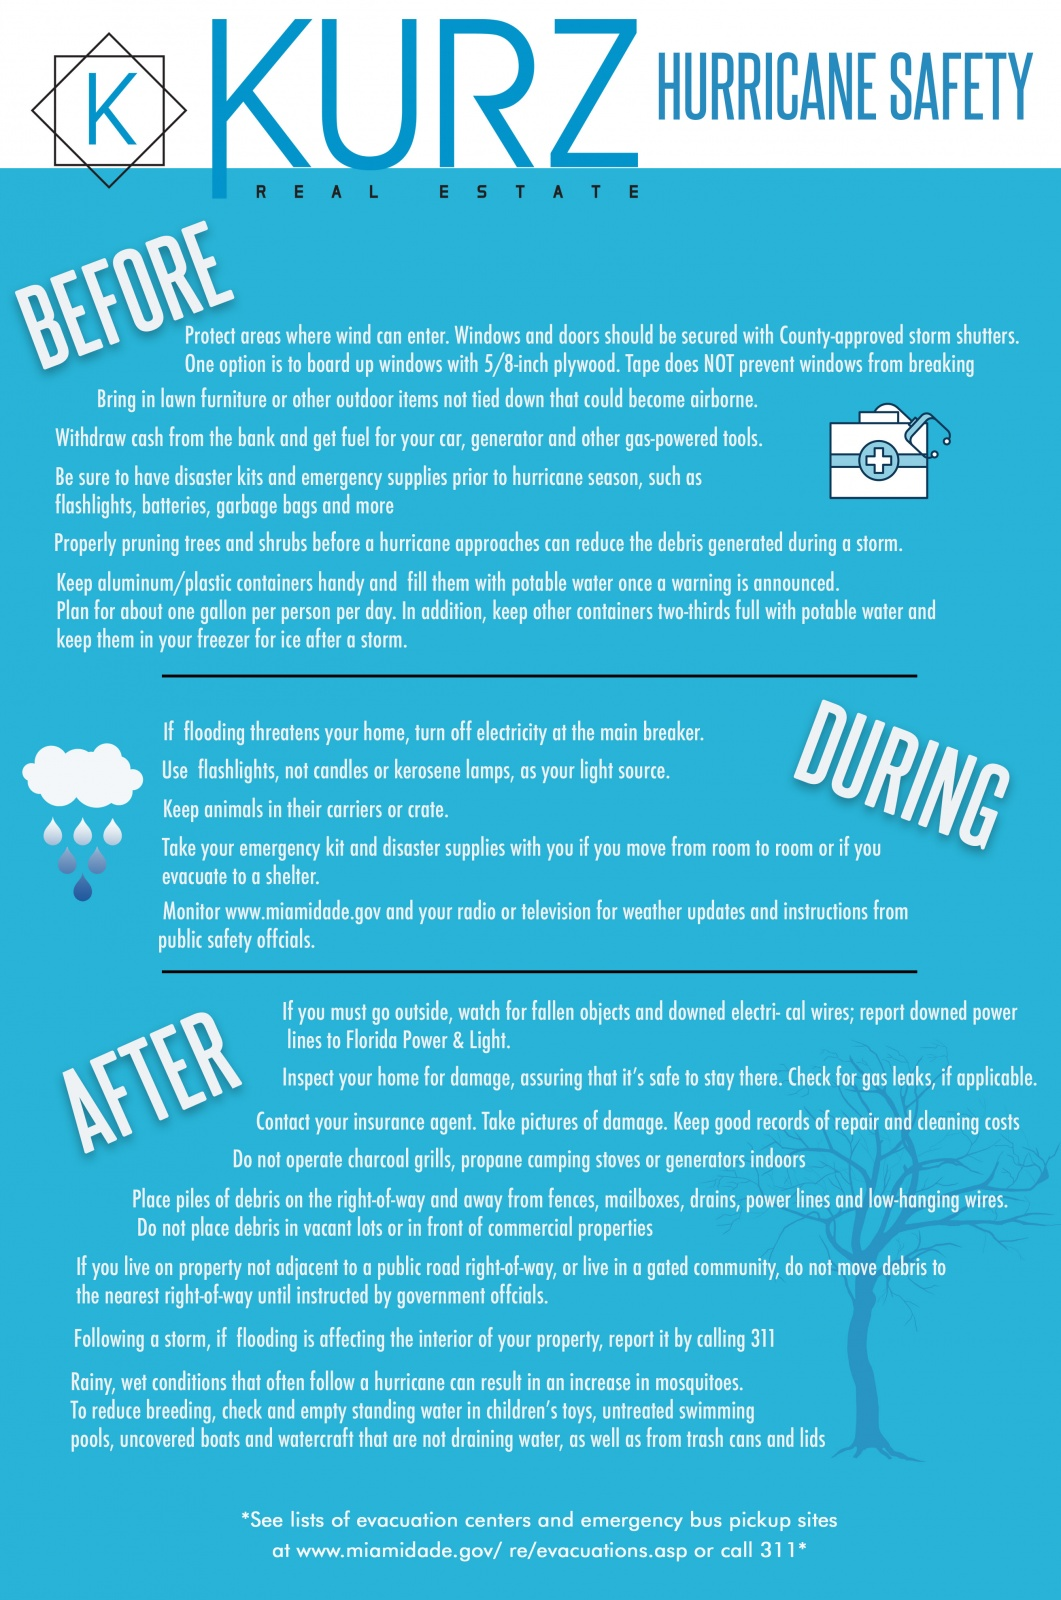 Kurz RE Hurricane Safety Tips